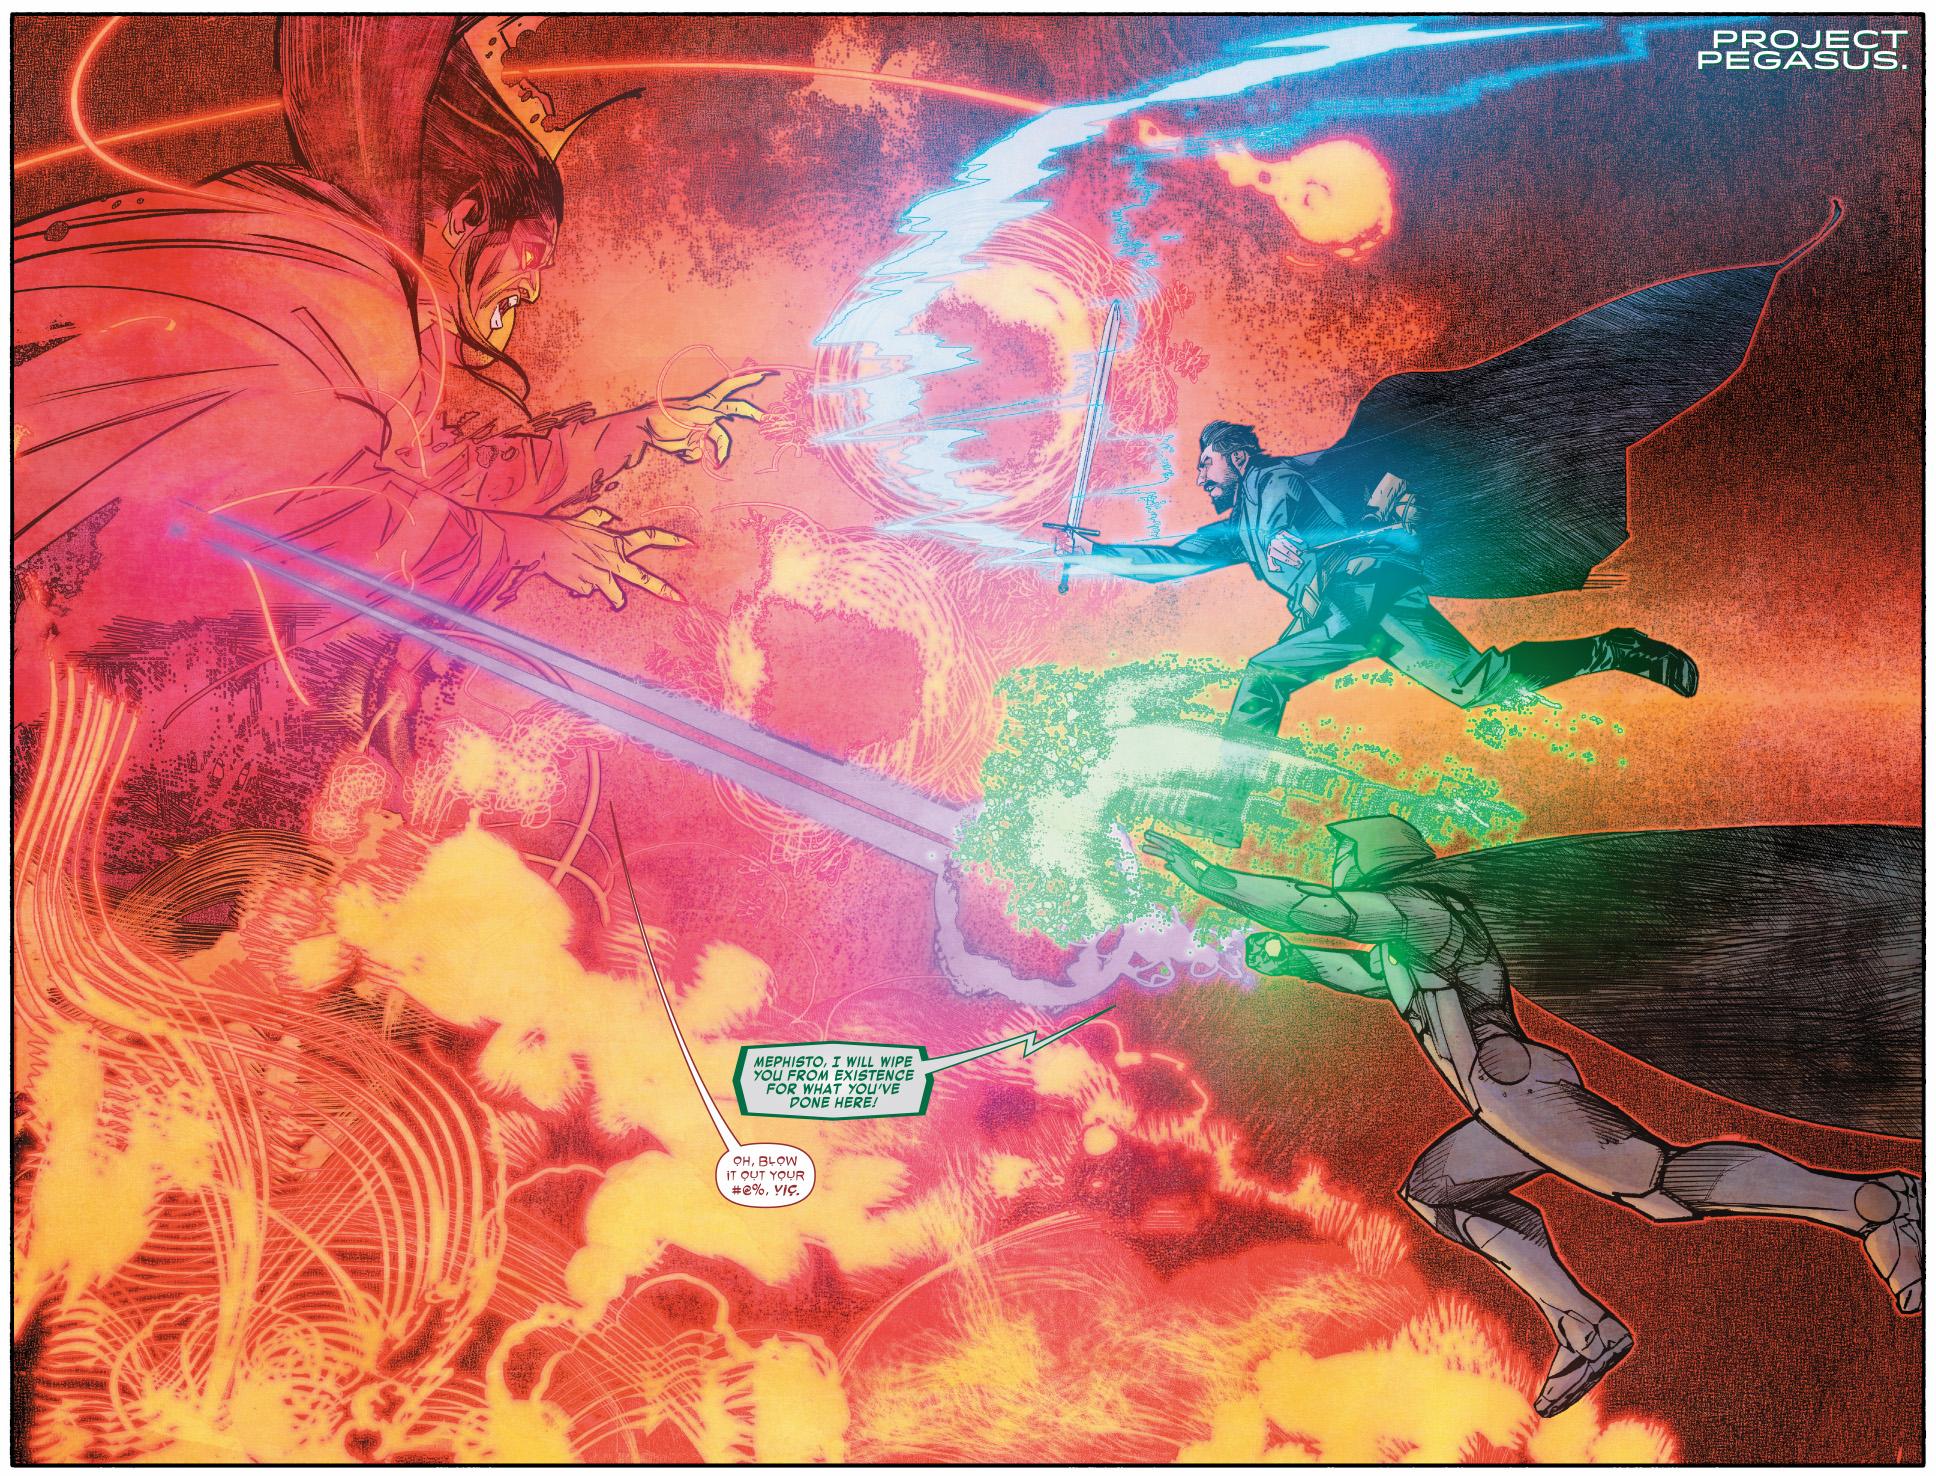 550cfde04c0 Infamous Iron Man And Doctor Strange VS Mephisto | Comicnewbies